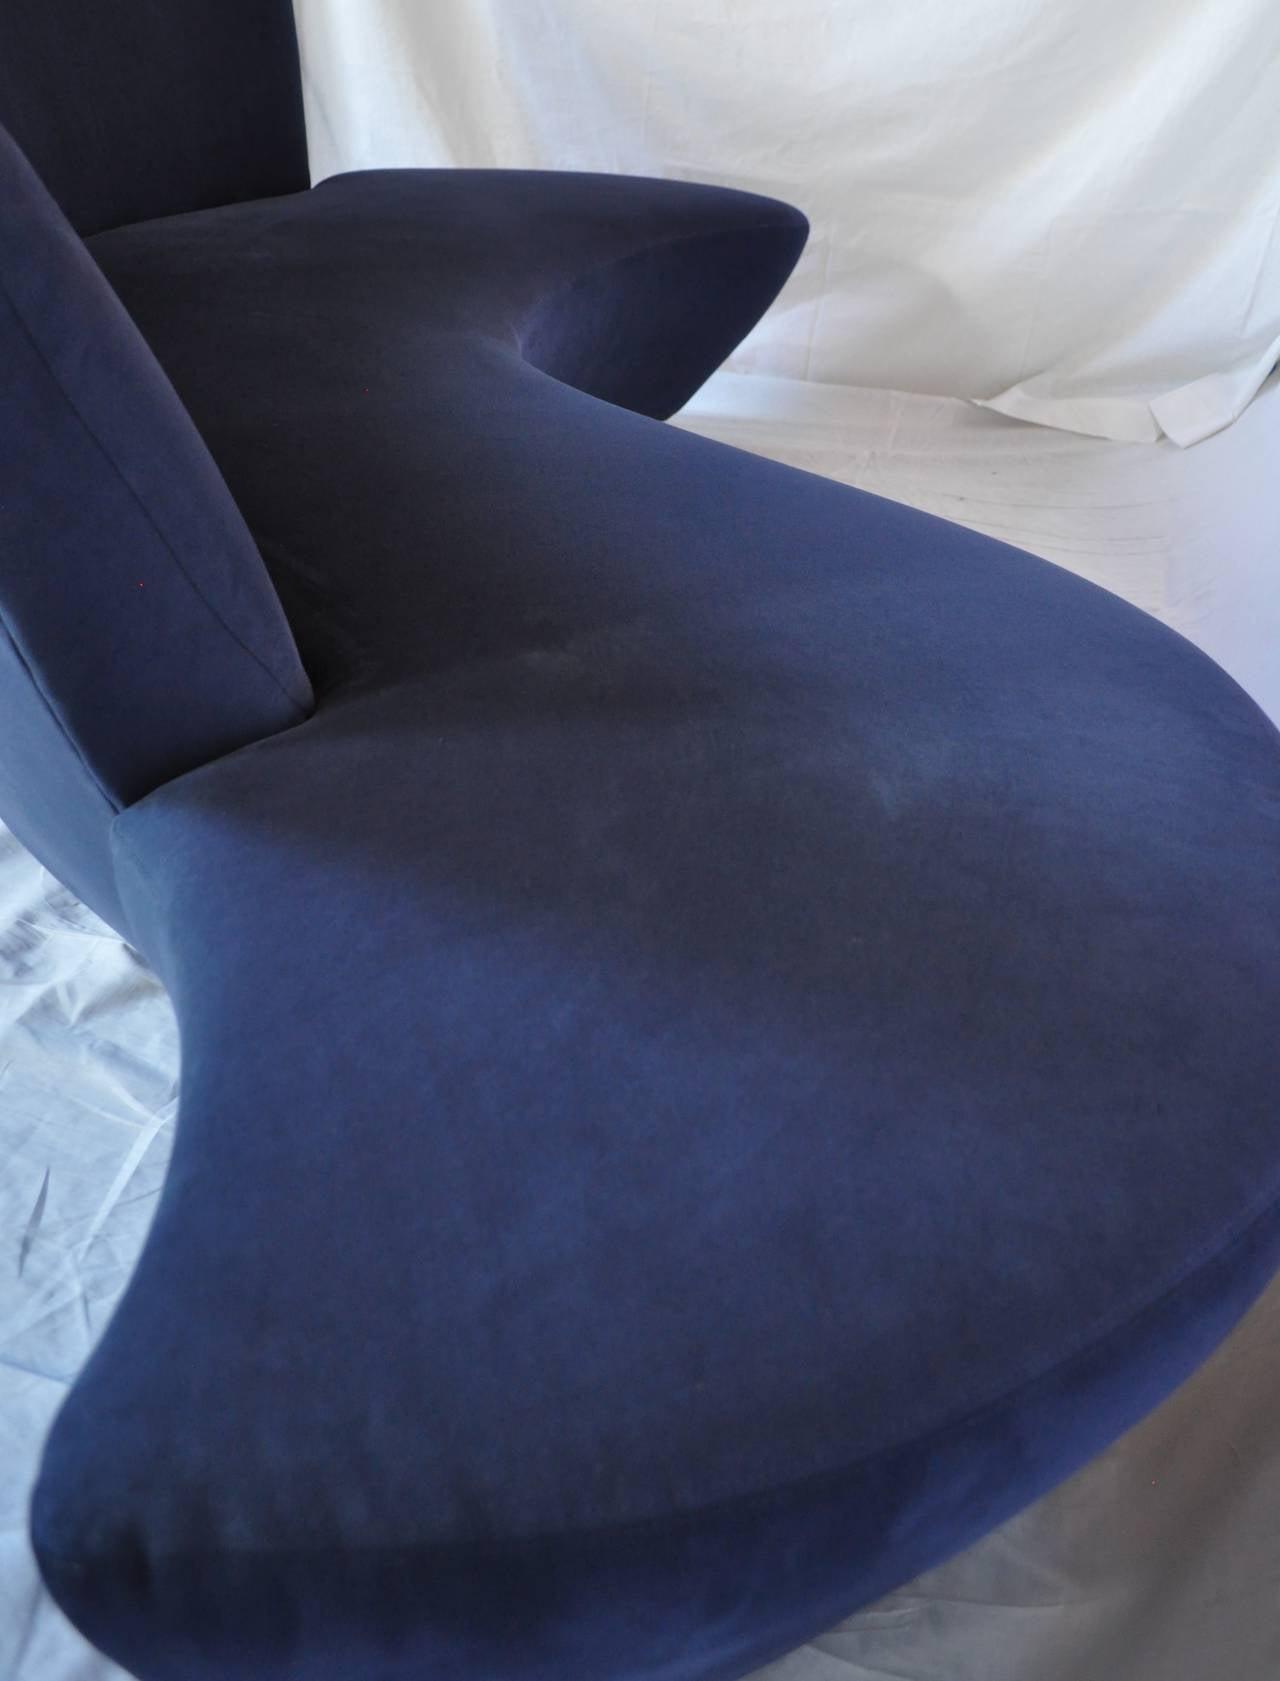 Vladimir Kagan Bilbao Curved Sculptural Sofa for Weiman Preview at